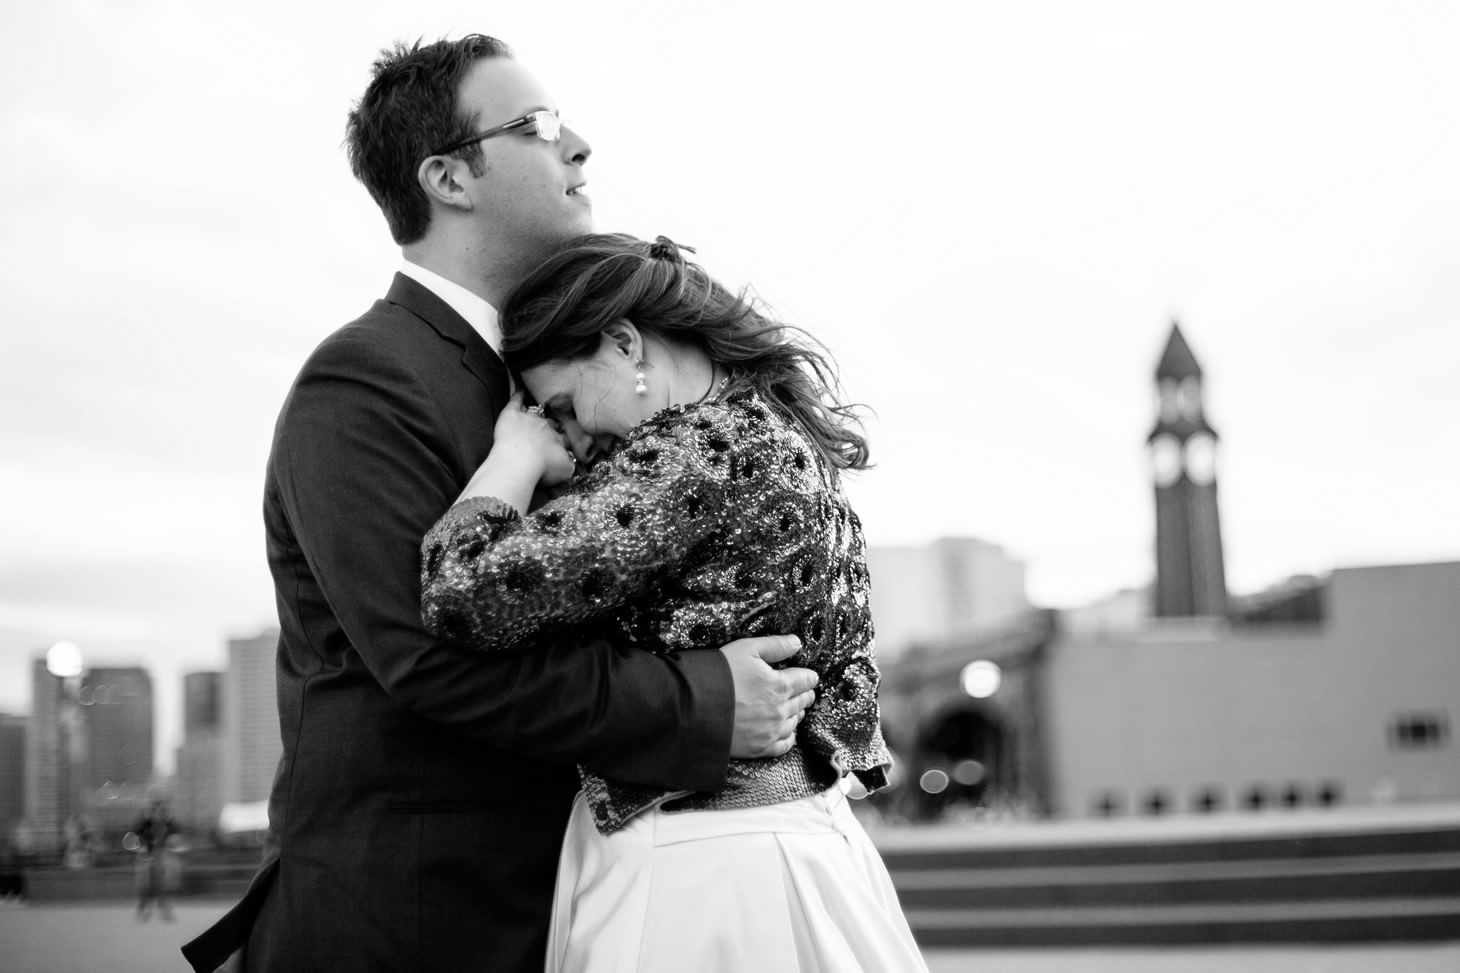 043-nyc-wedding-photographer-hoboken-waterfront-wedding-photos-smitten-chickens.jpg